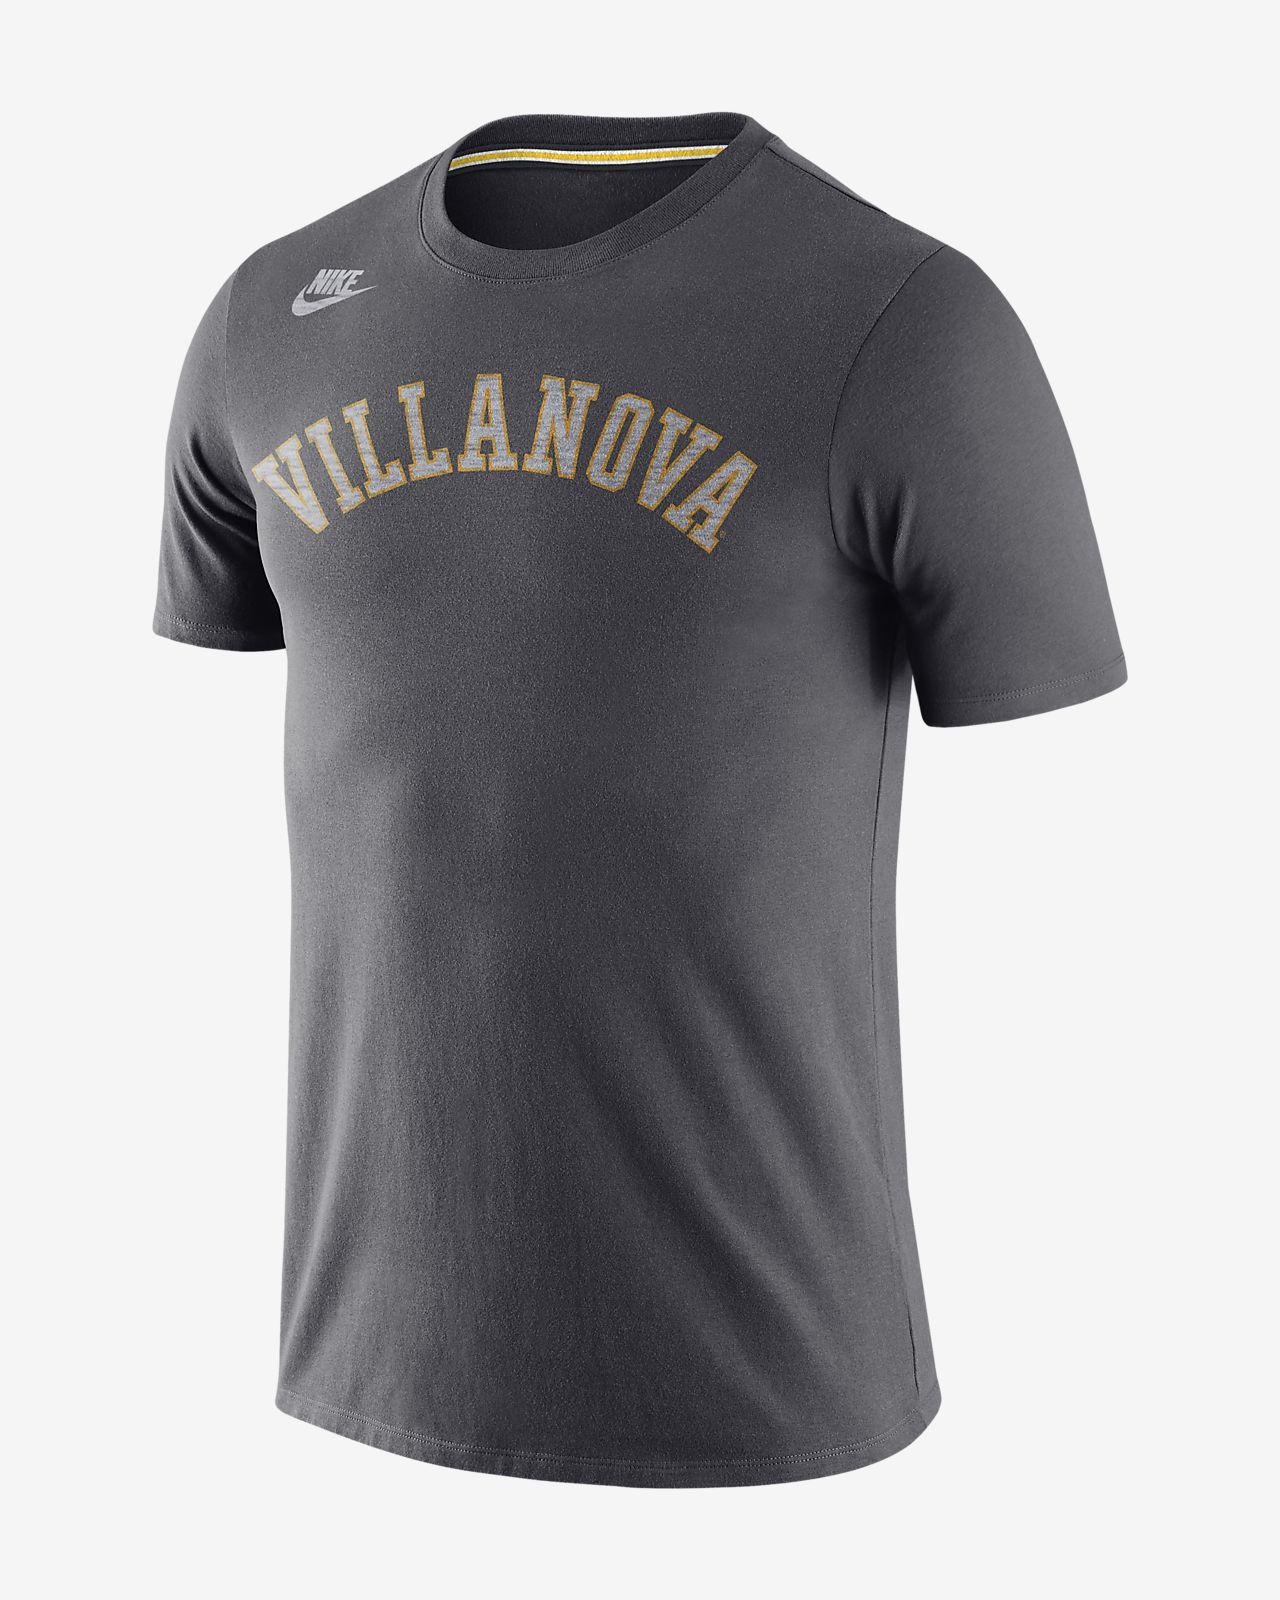 Nike College Retro (Villanova) Men's T-Shirt